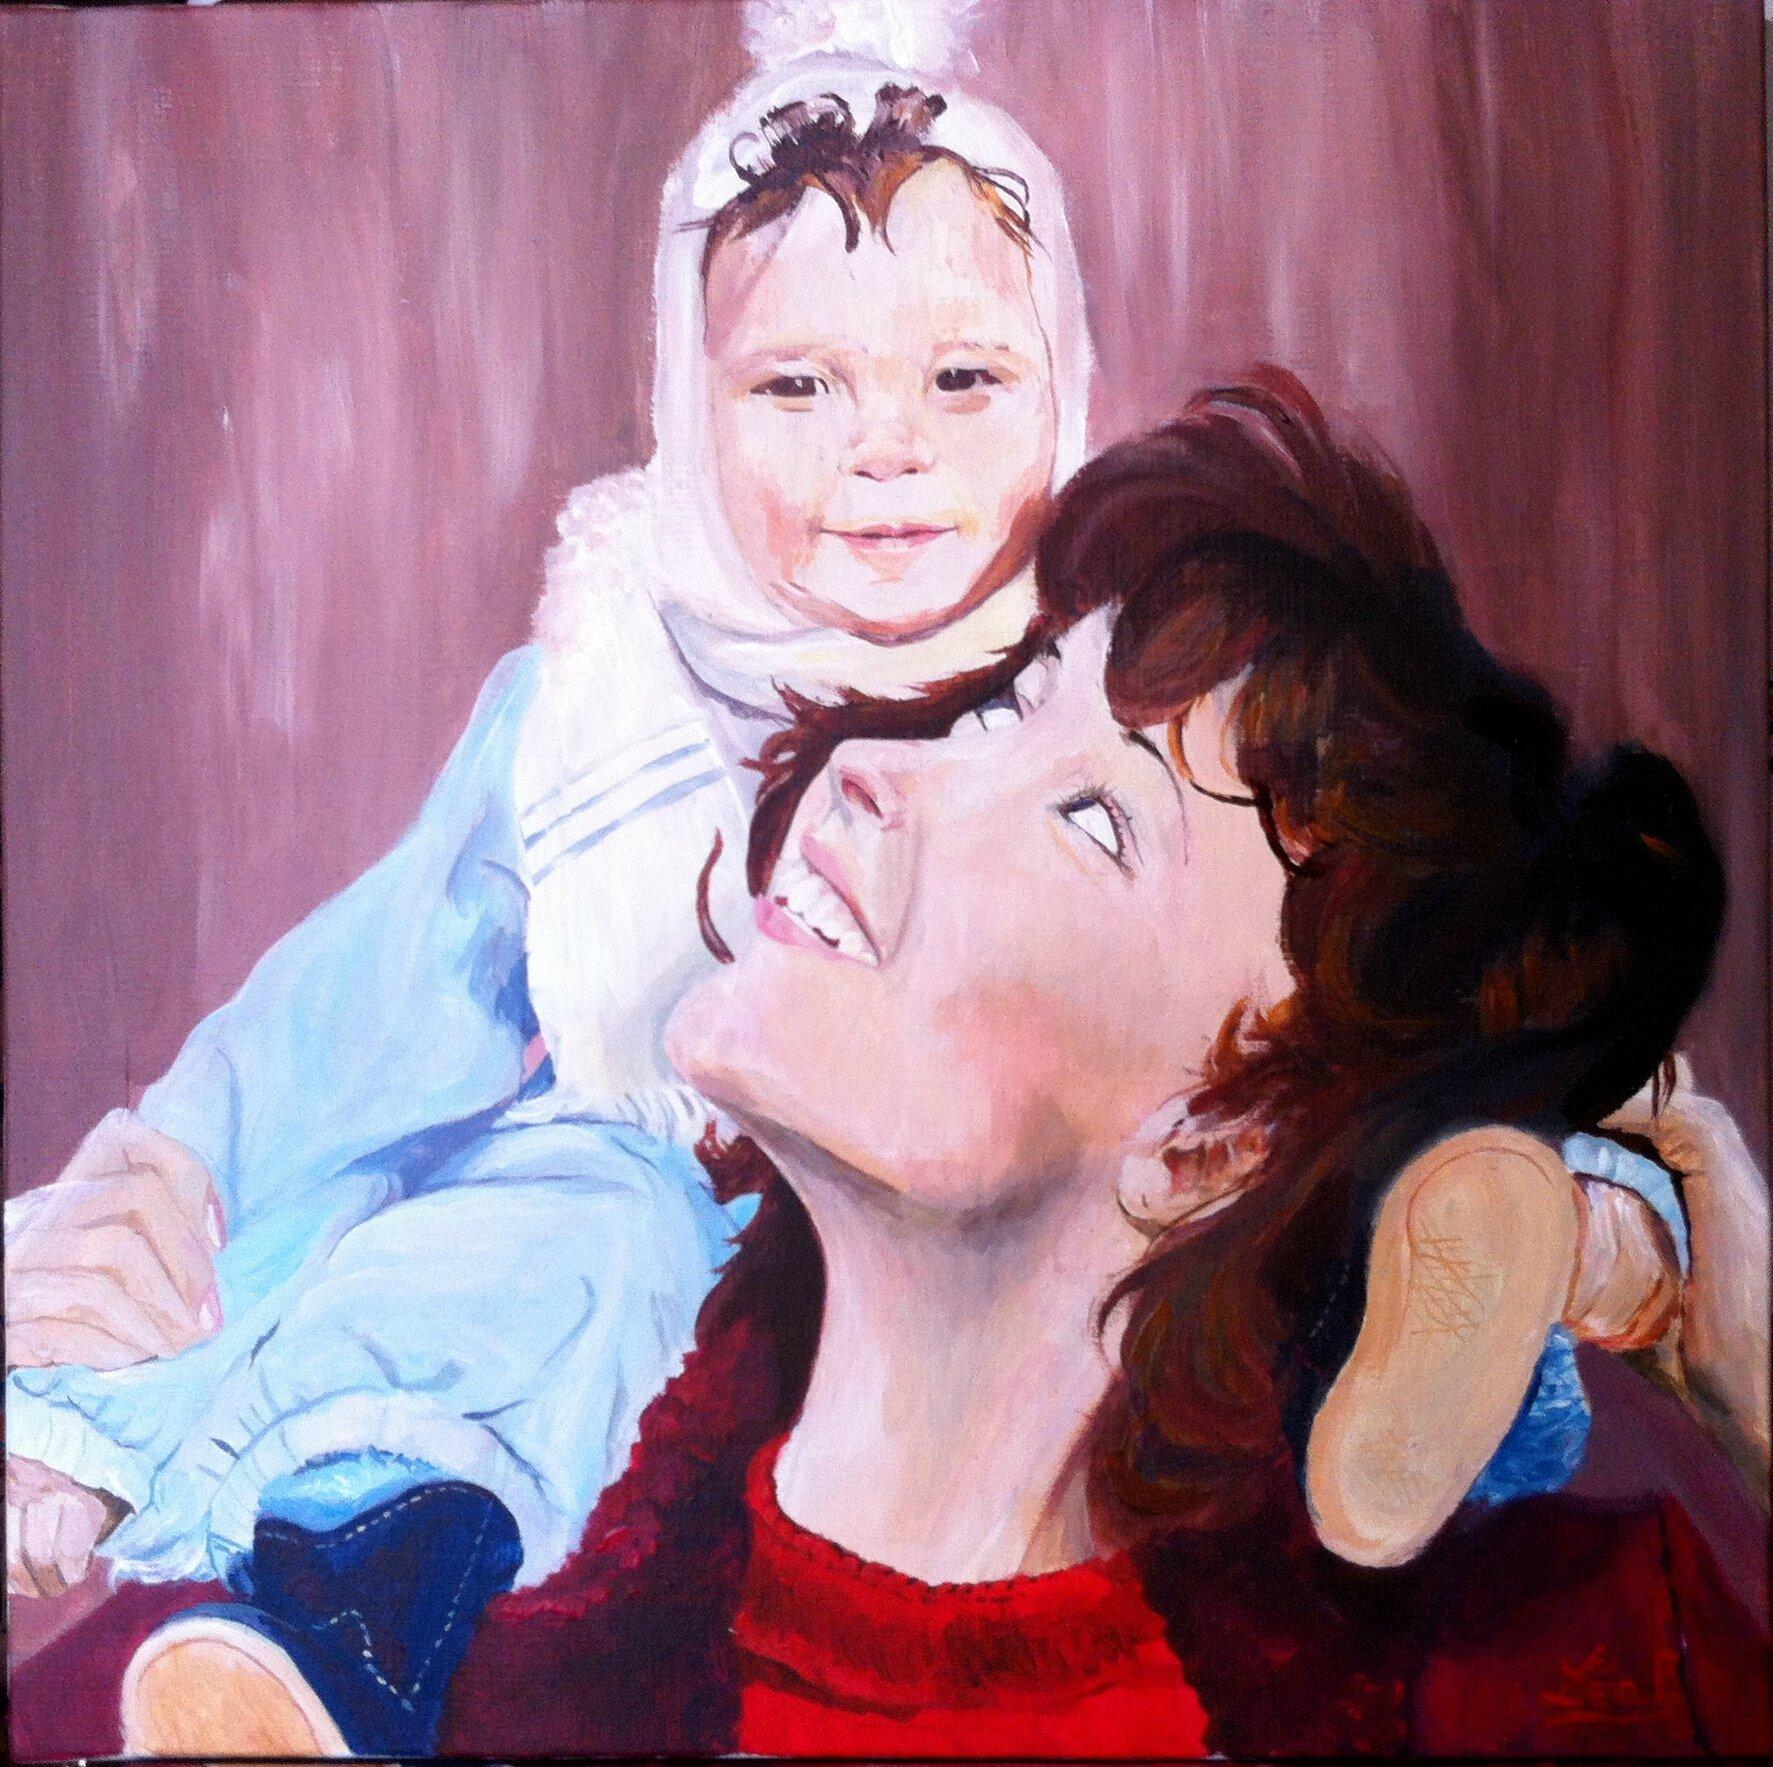 Maman avec son petit garçon